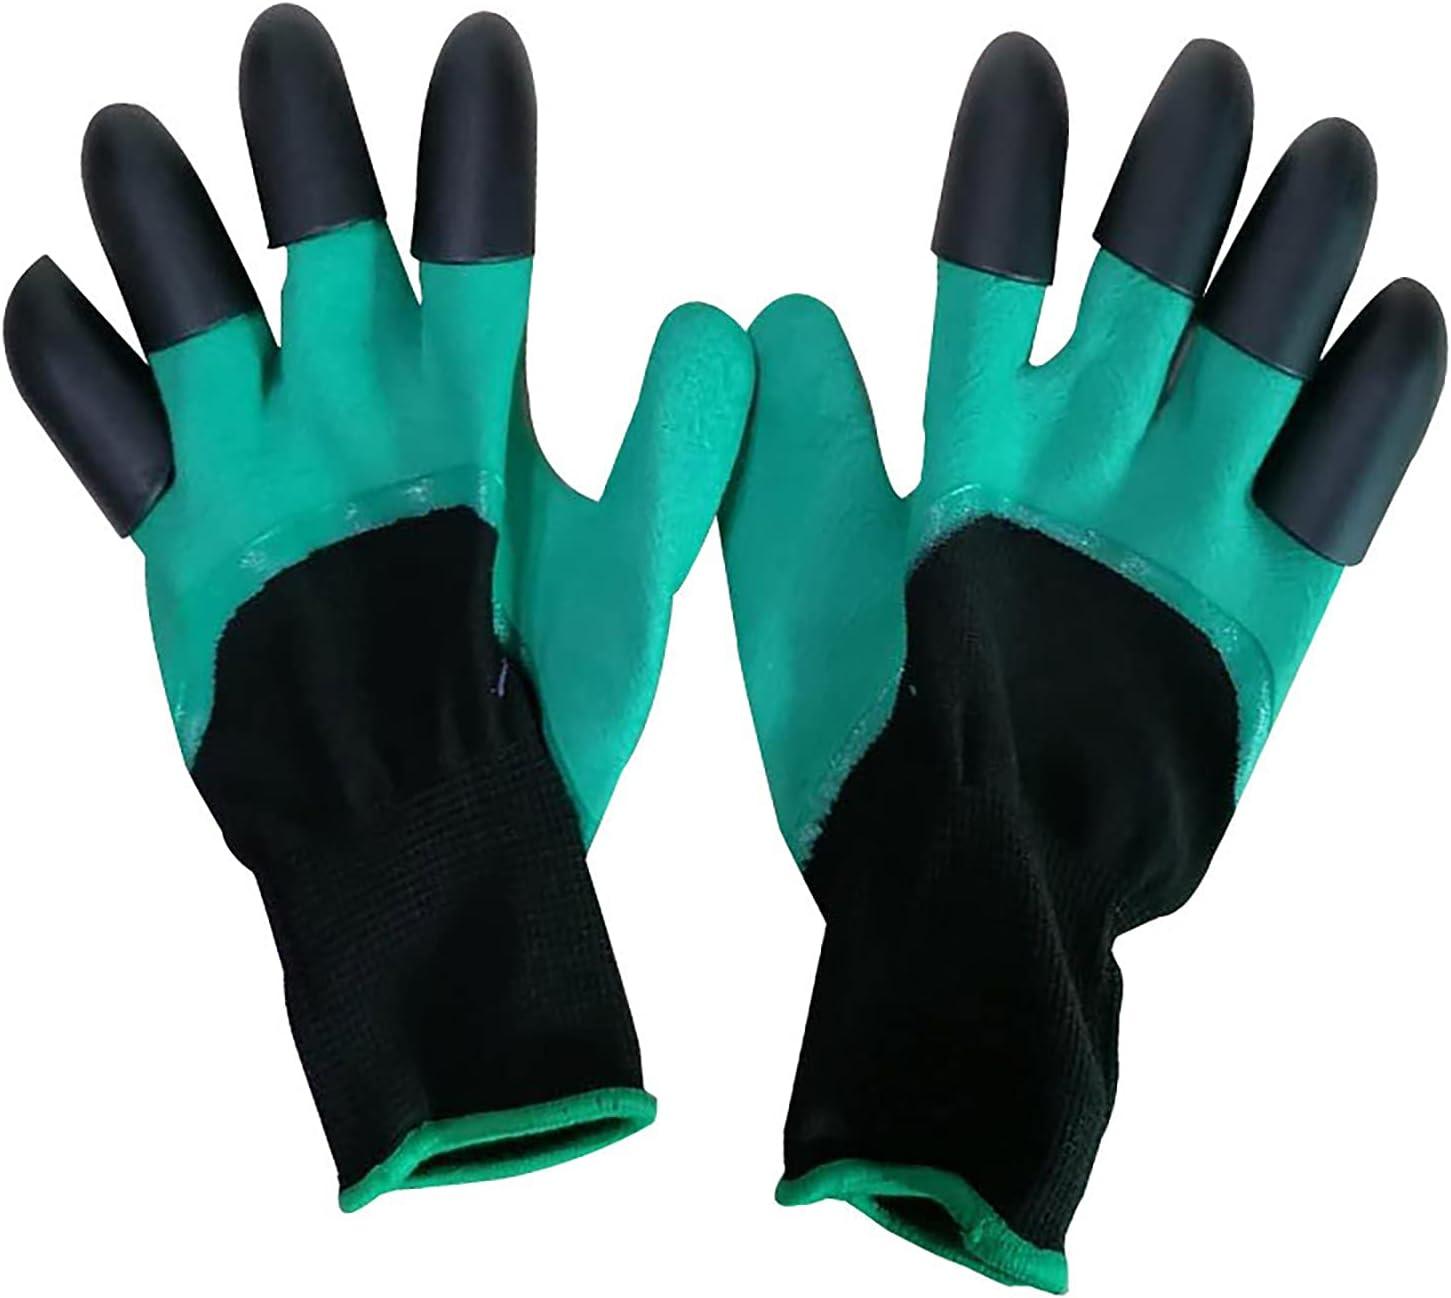 TMF Ranking Ranking TOP1 integrated 1st place Rubber Flexible Gardening Gloves Weeding Gar Outdoor Seeding